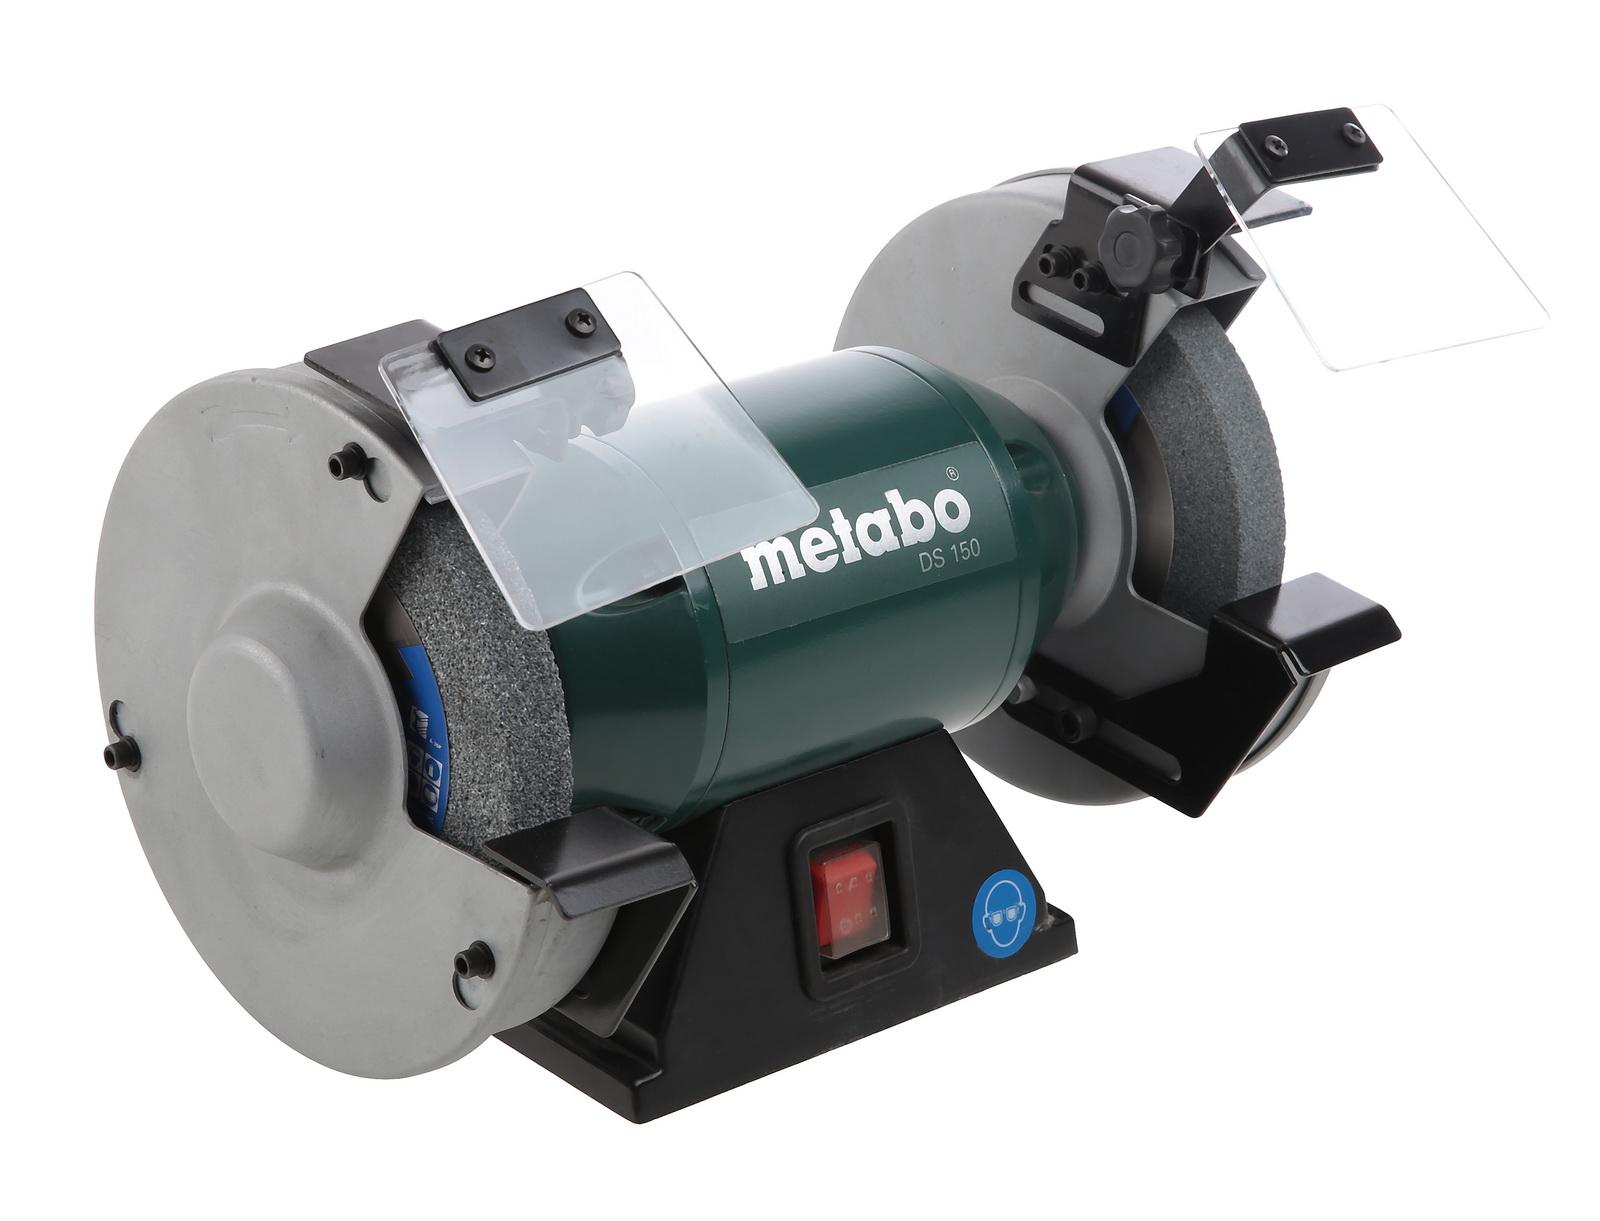 Точило Metabo Ds 150 (619150000) точило metabo ds 150 619150000